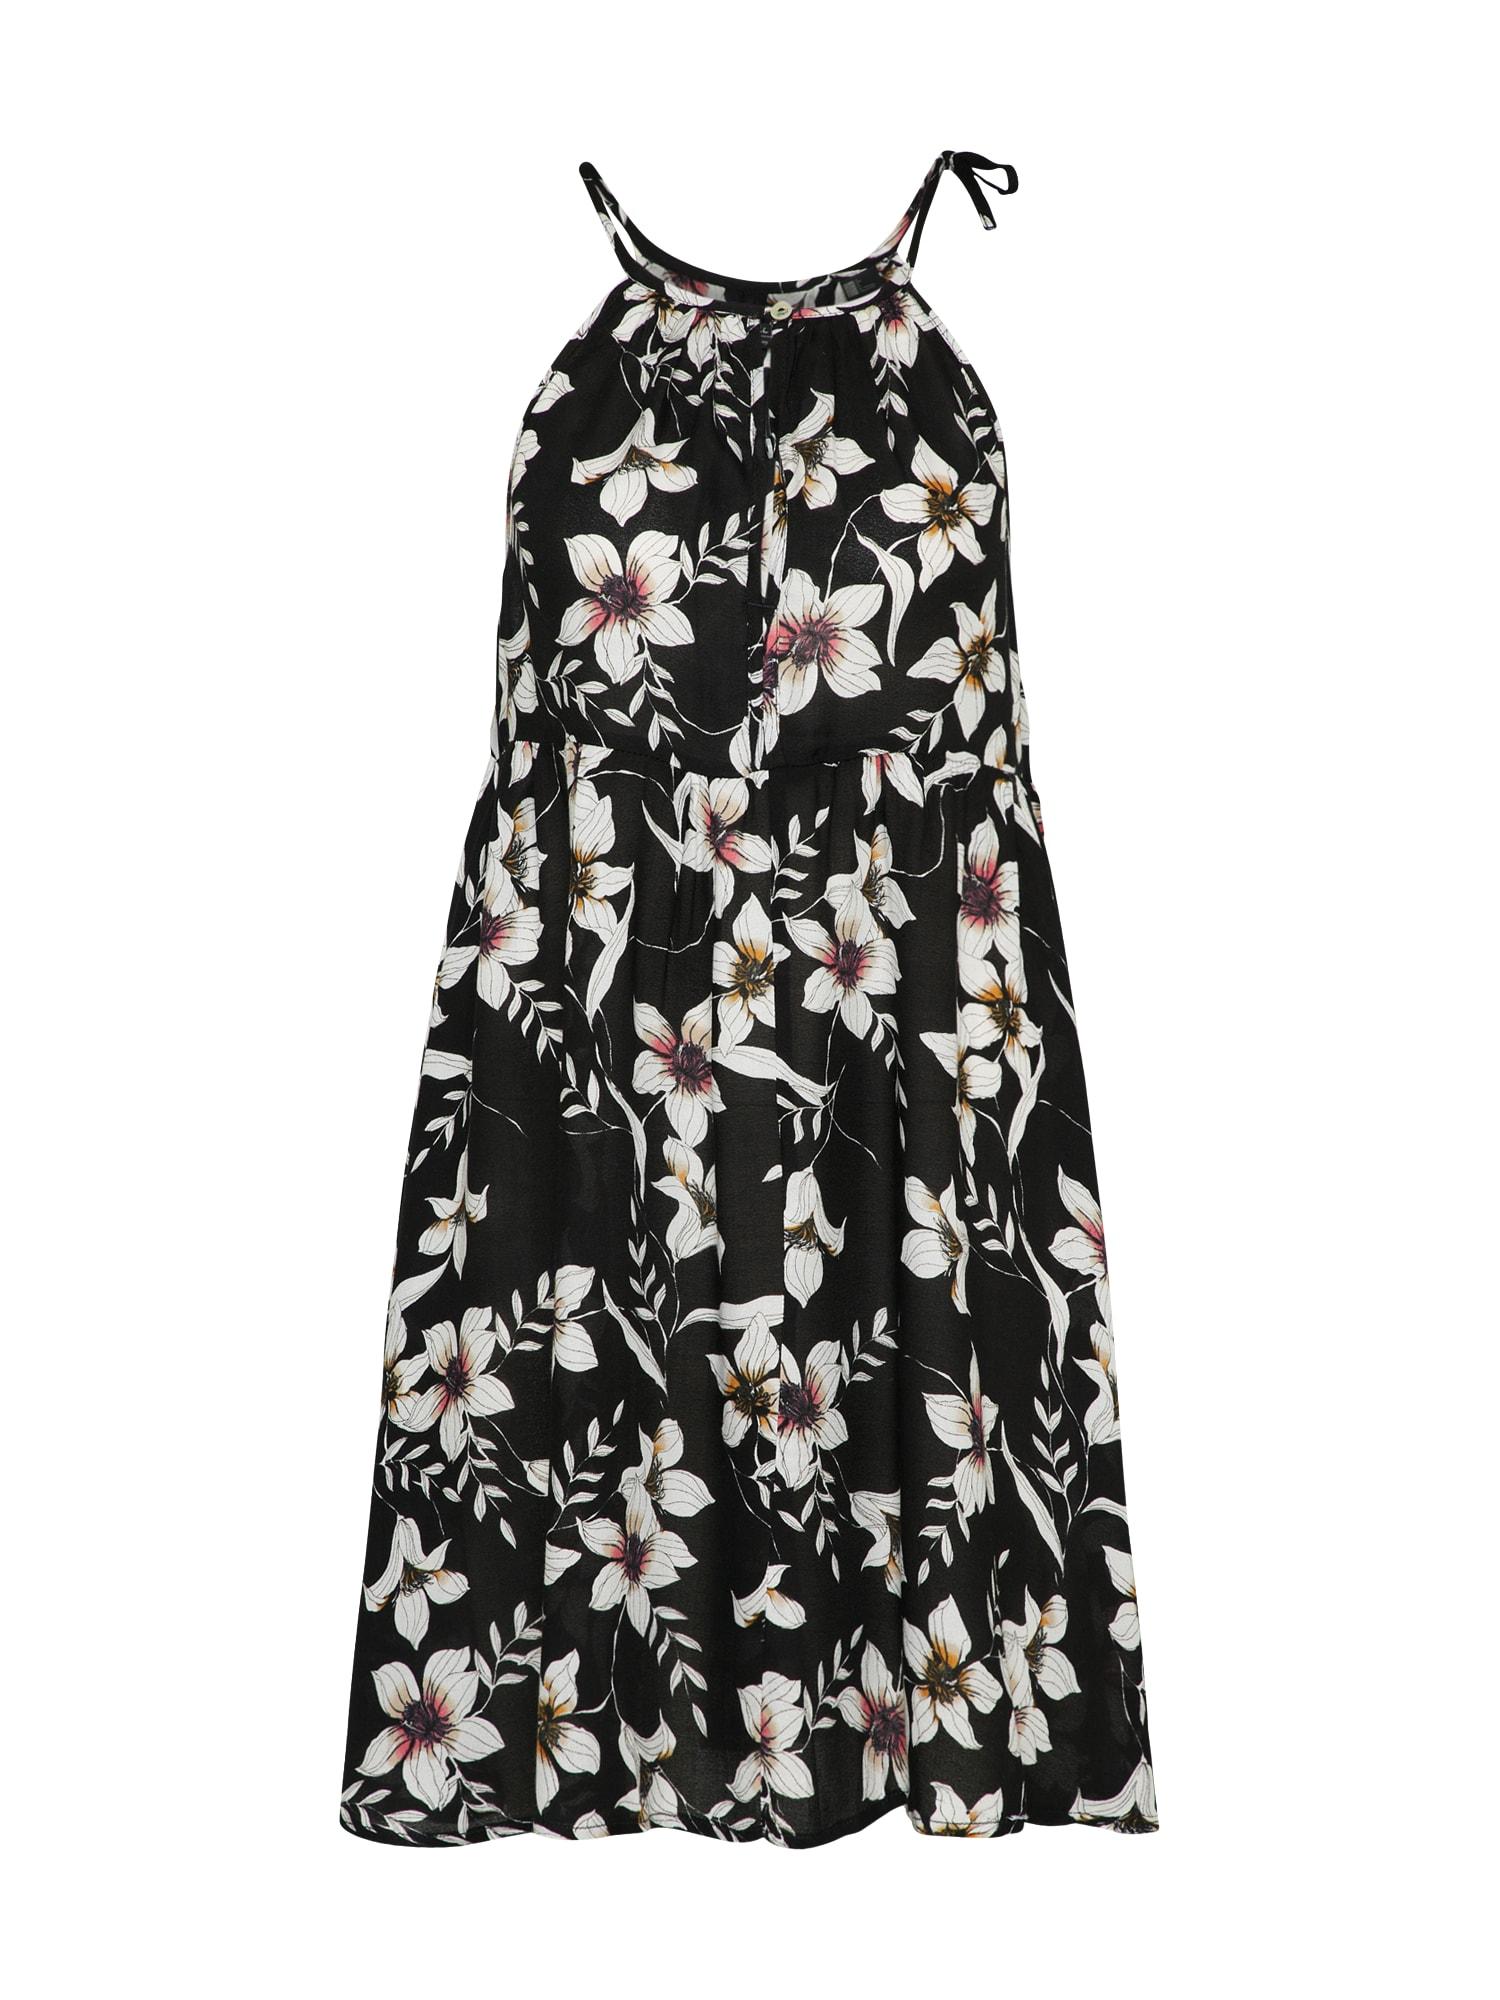 ONEILL Letní šaty černá bílá O'NEILL